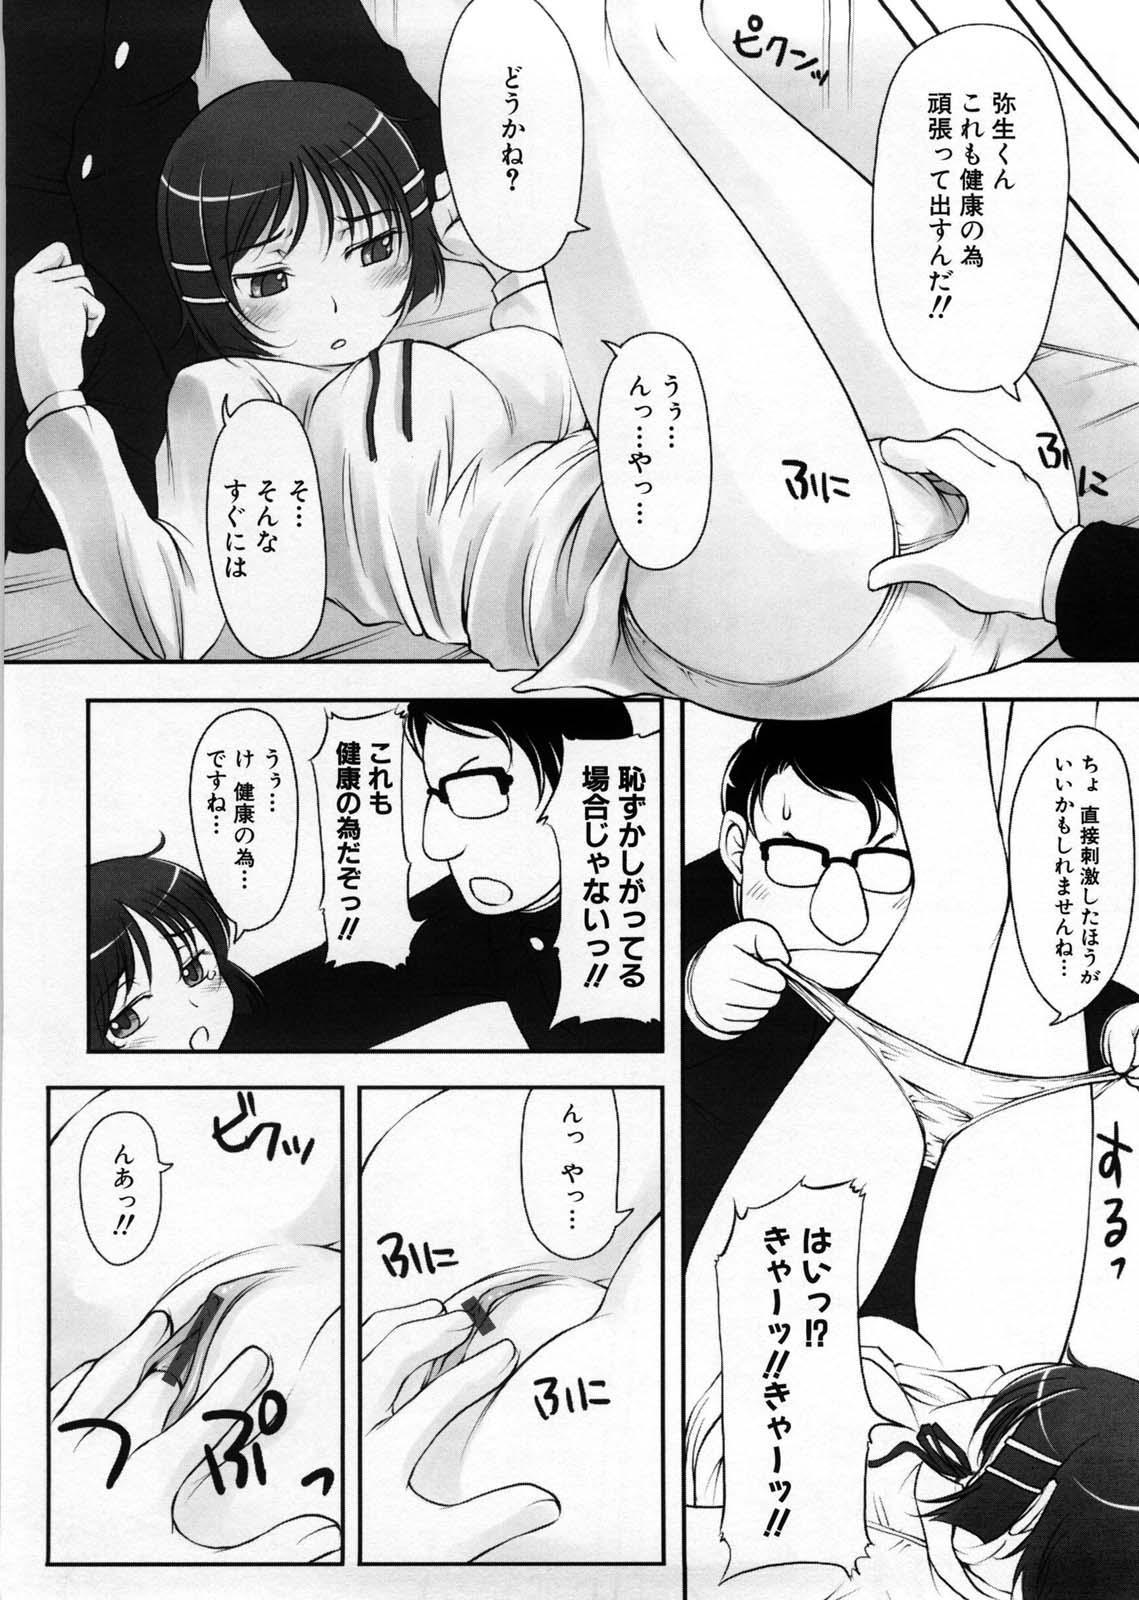 Imouto Ijou Hahaoya Miman 174